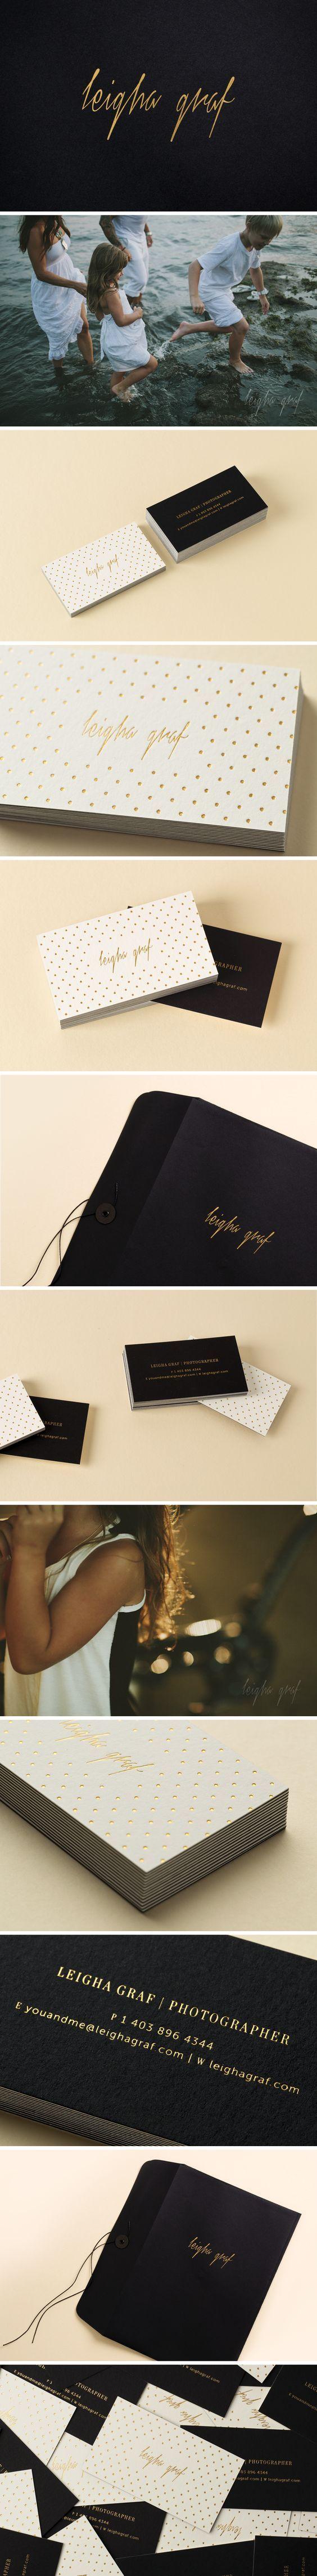 Leigha Graf Branding by One Plus One Design | Fivestar Branding – Design and Branding Agency & Inspiration Gallery